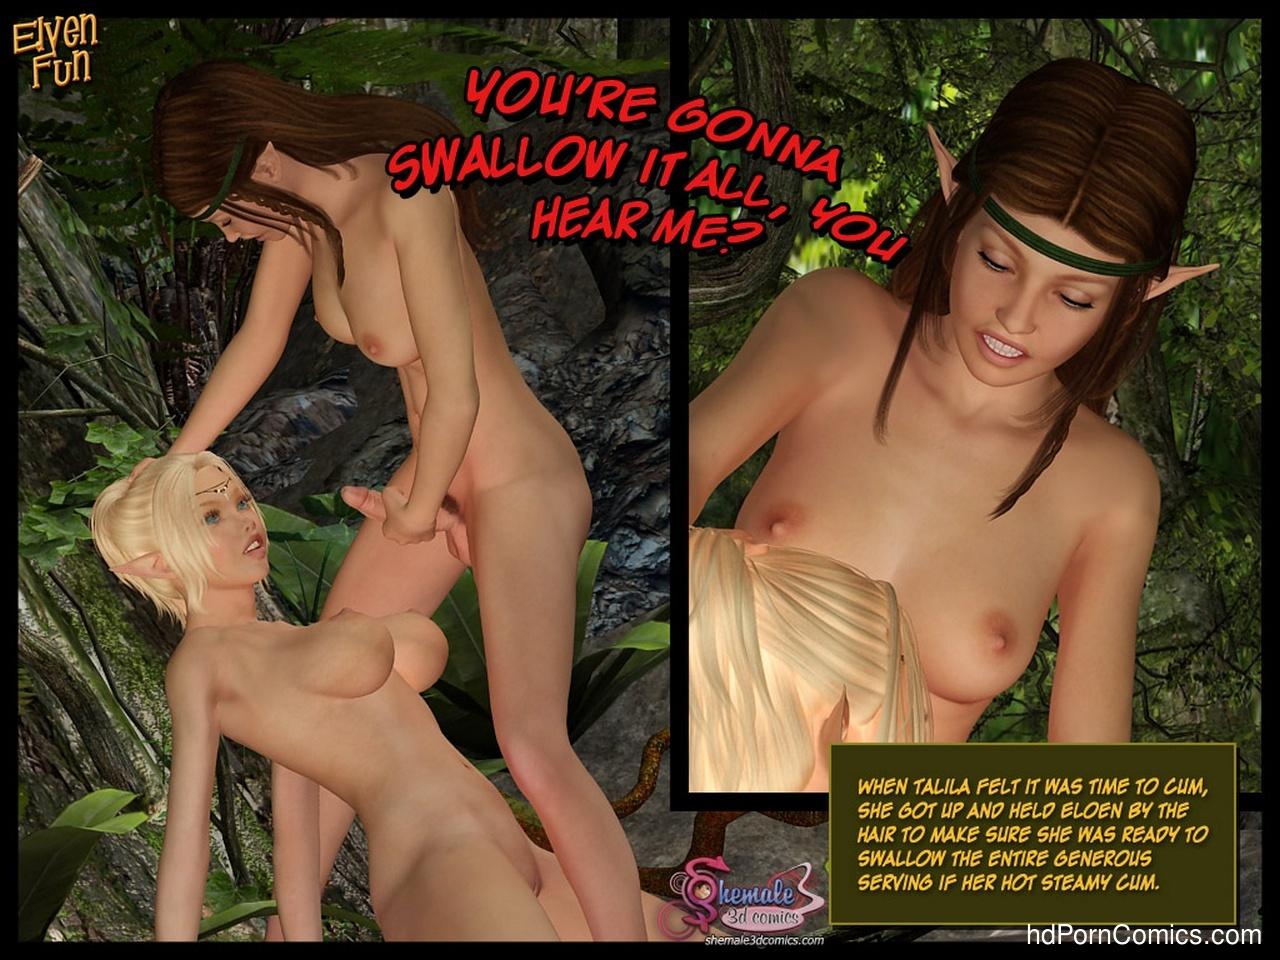 Elven-Fun44 free sex comic